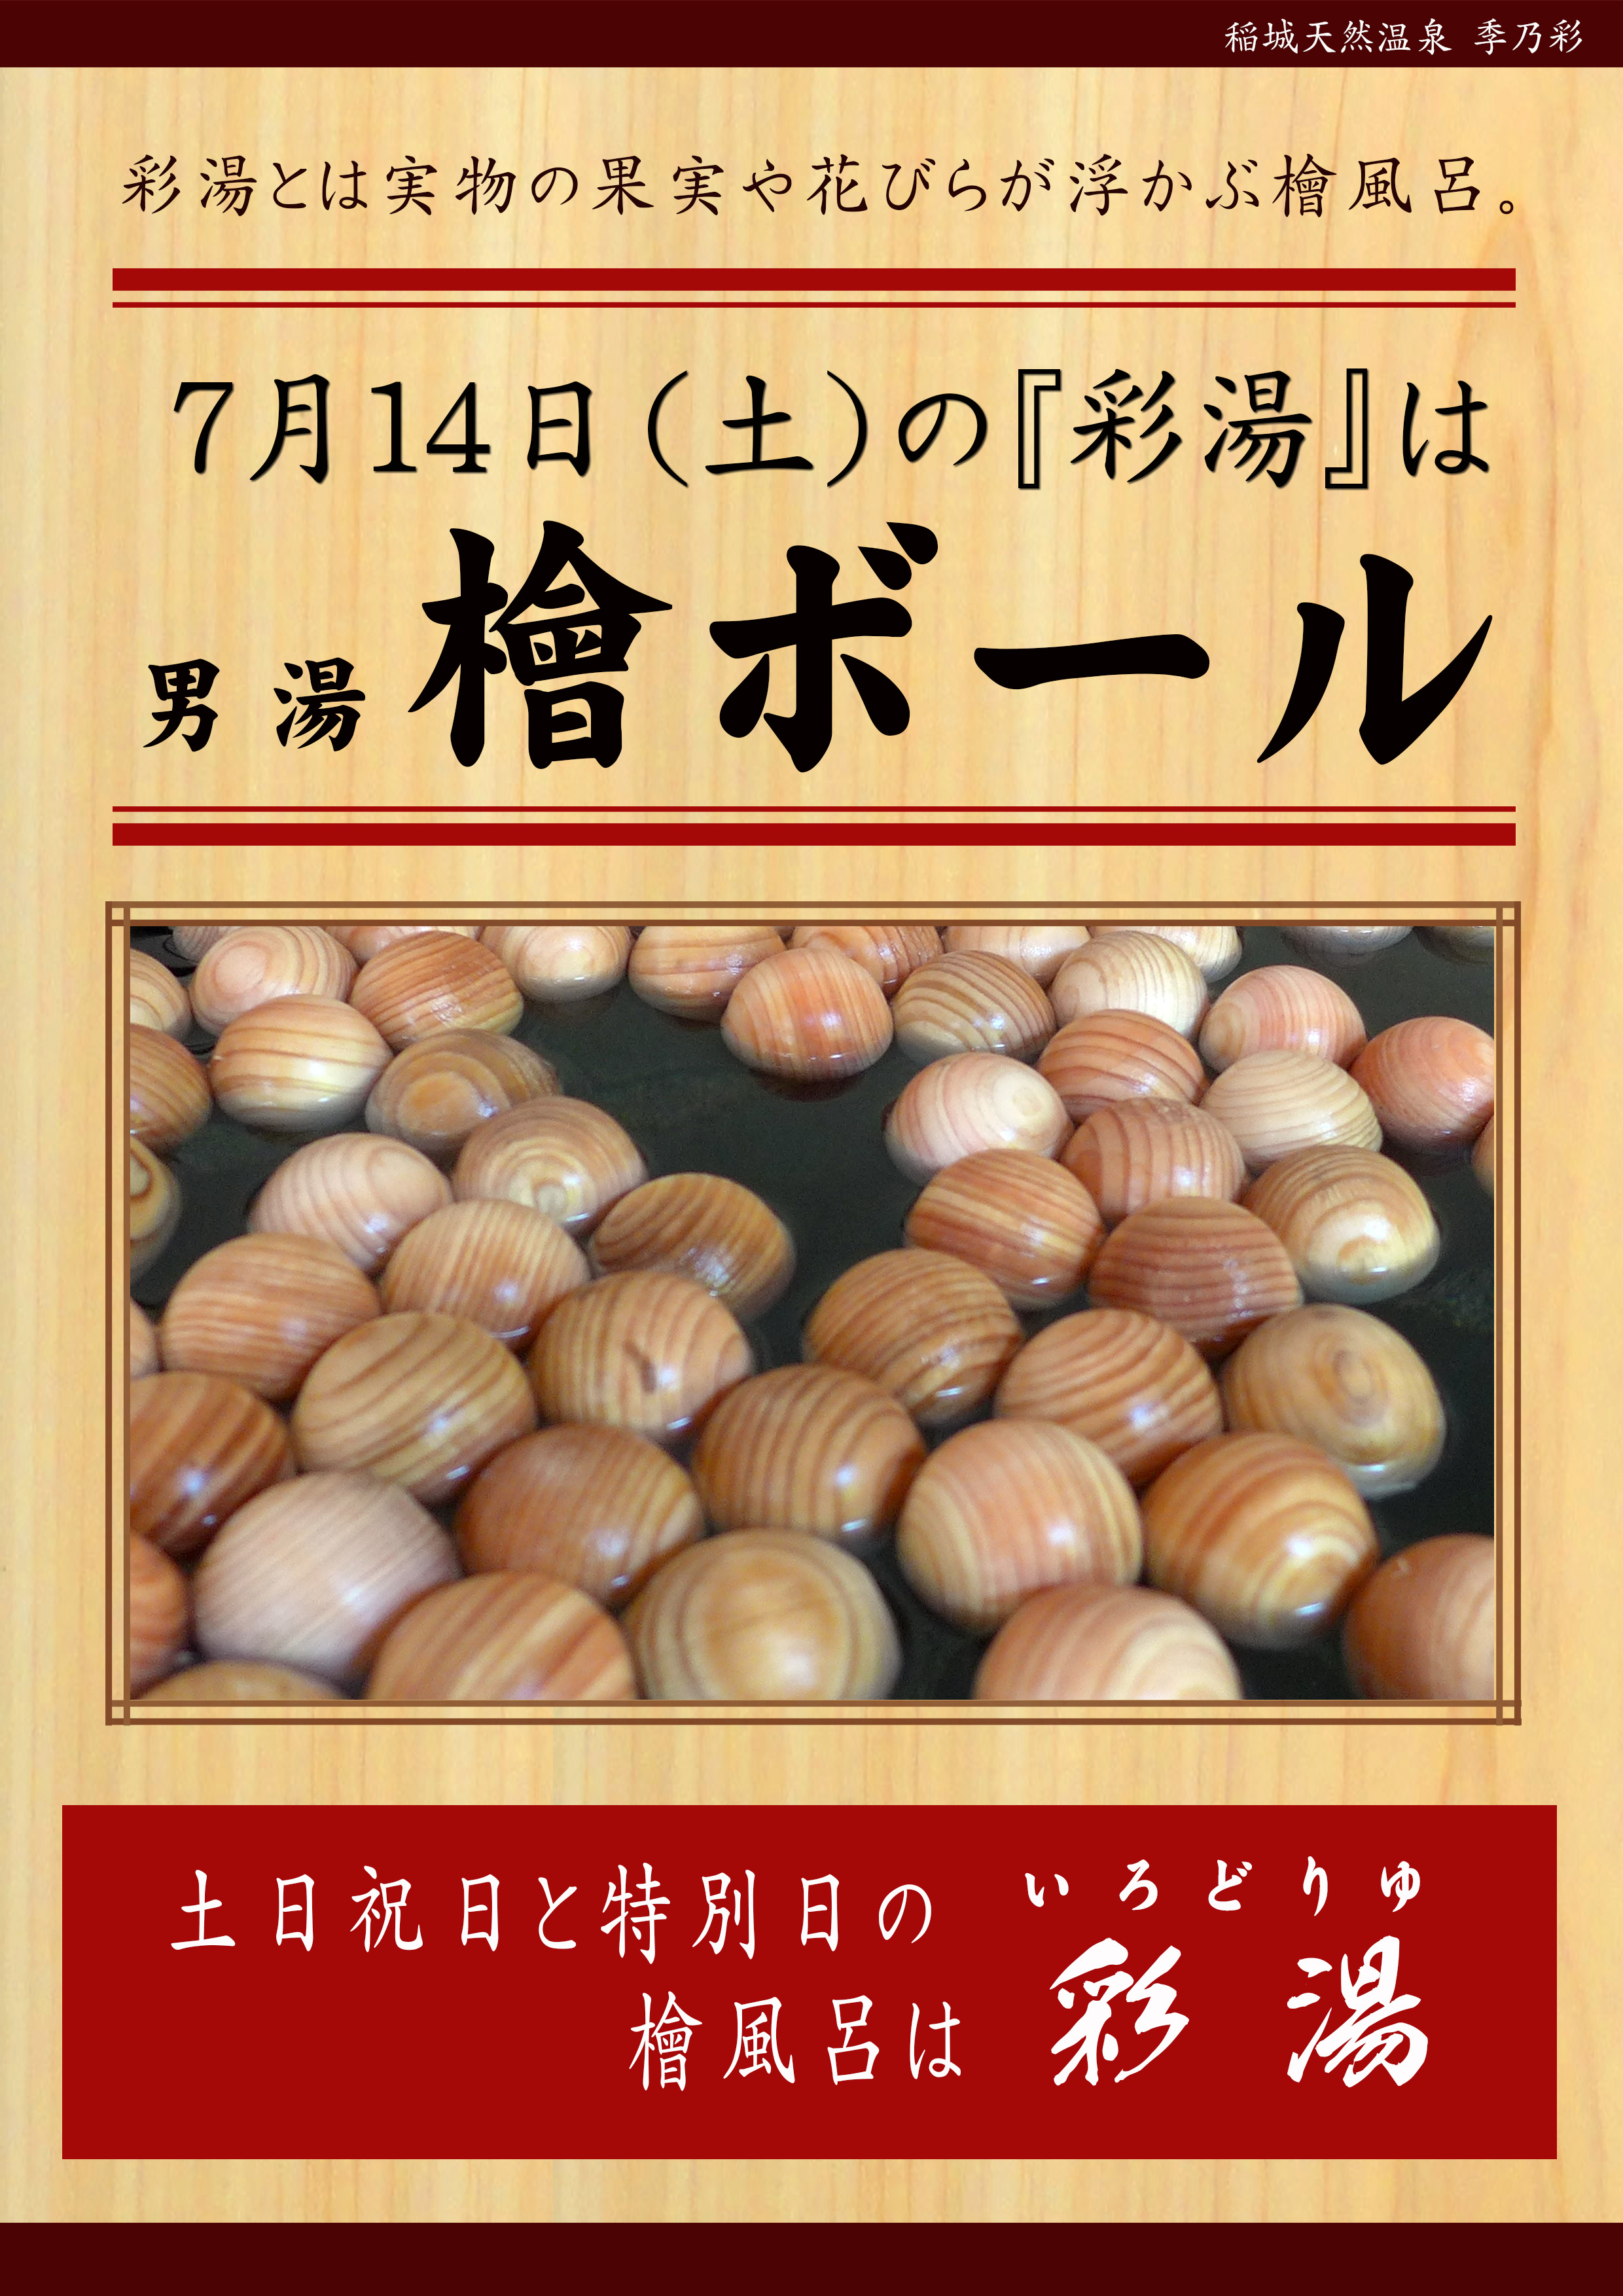 20180714POP イベント 彩湯 檜ボール